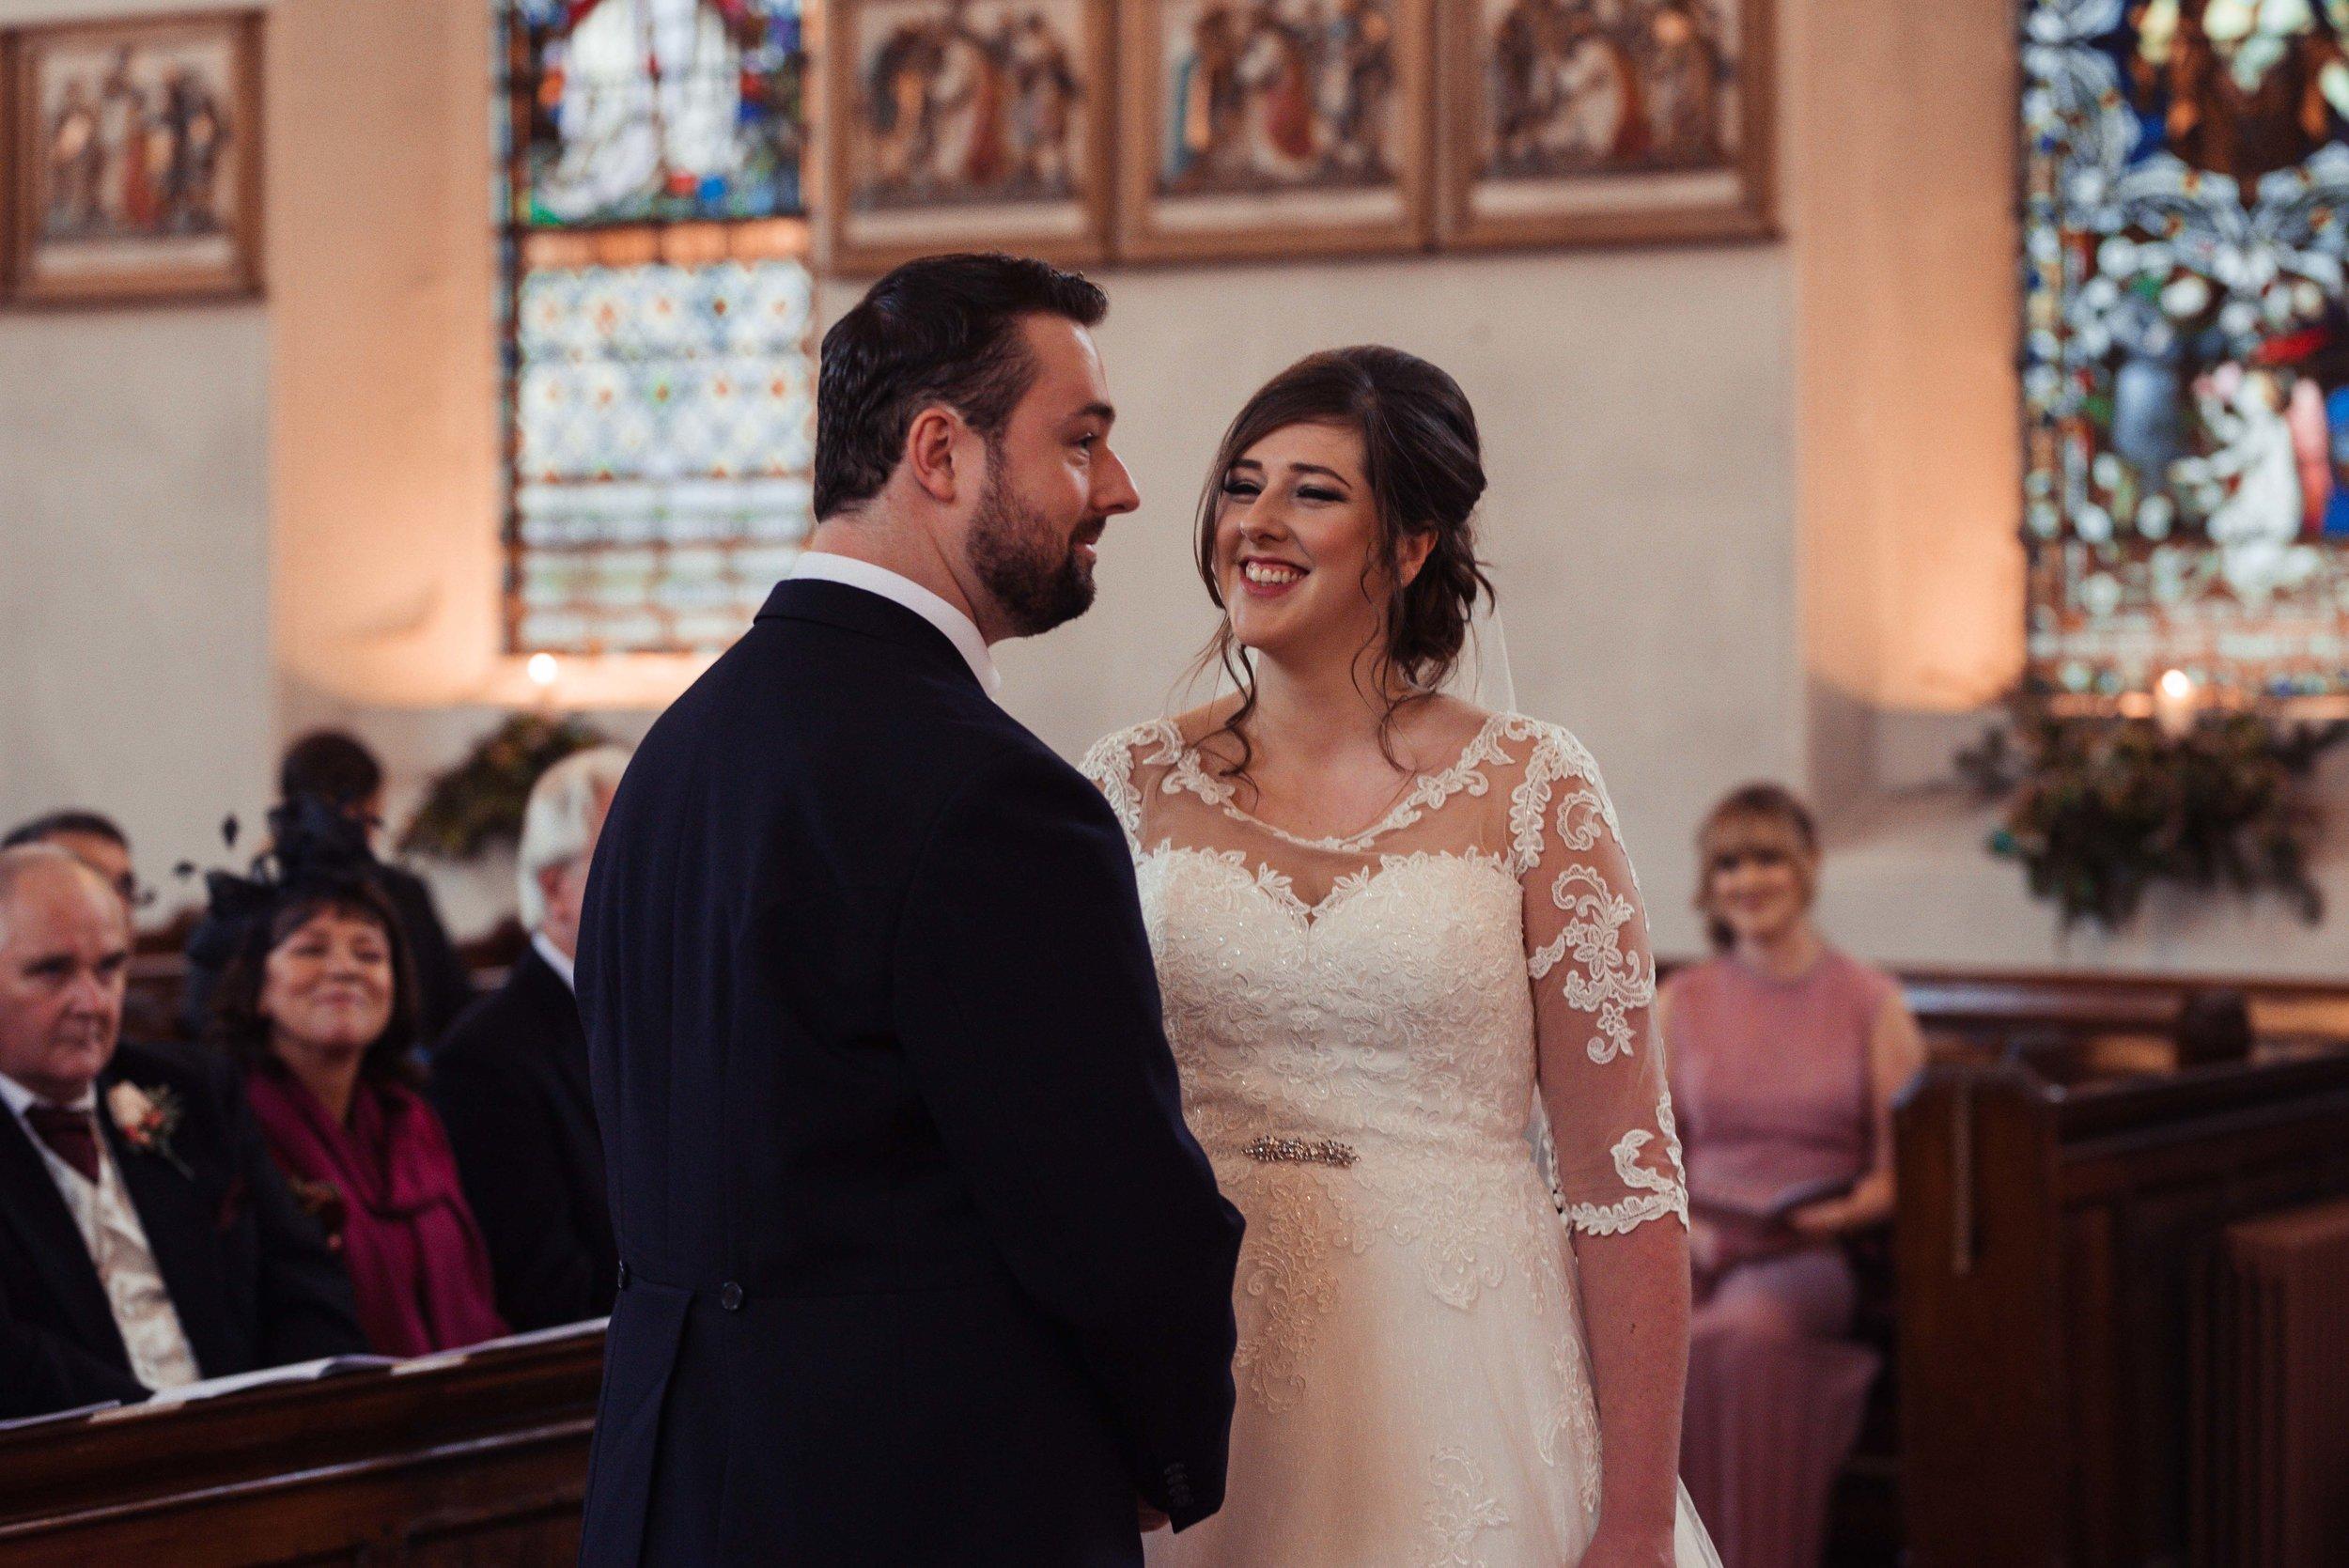 Belsfield-wedding-photography-15.jpg